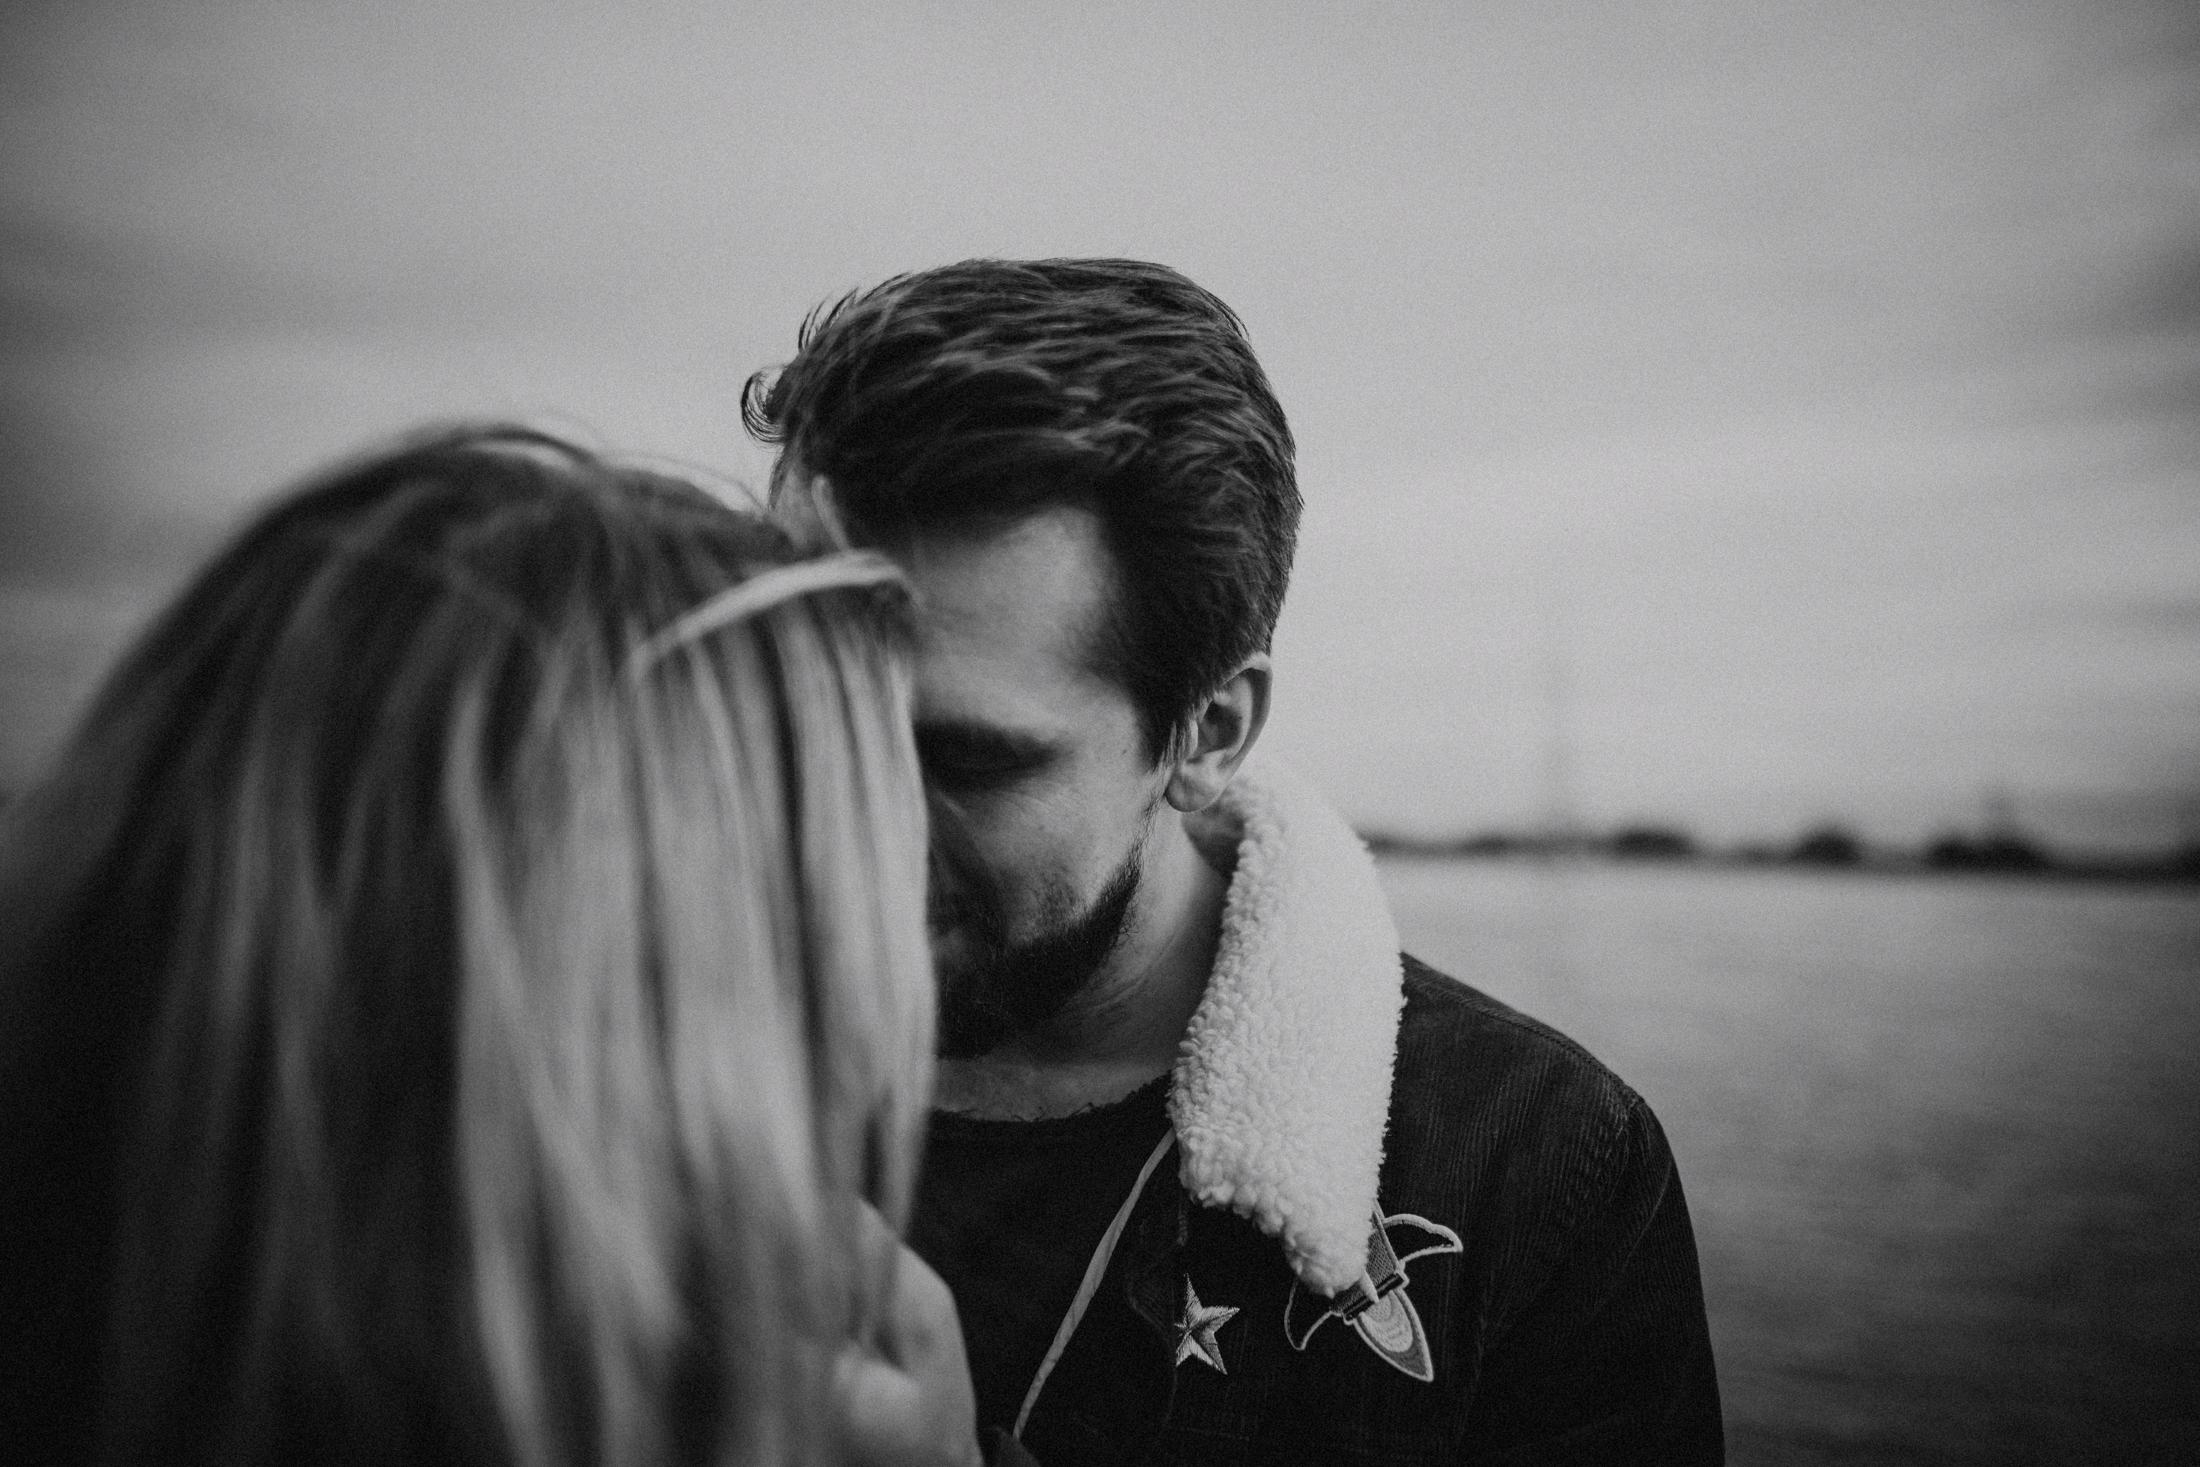 Wedding_Photographer_Mallorca_DanielaMarquardt_Photography_CanaryIslands_Lanzarote_Iceland_Tuscany_Santorini_Portugal_NewYork_Spain_Elopement_Hochzeitsfotograf_CK74